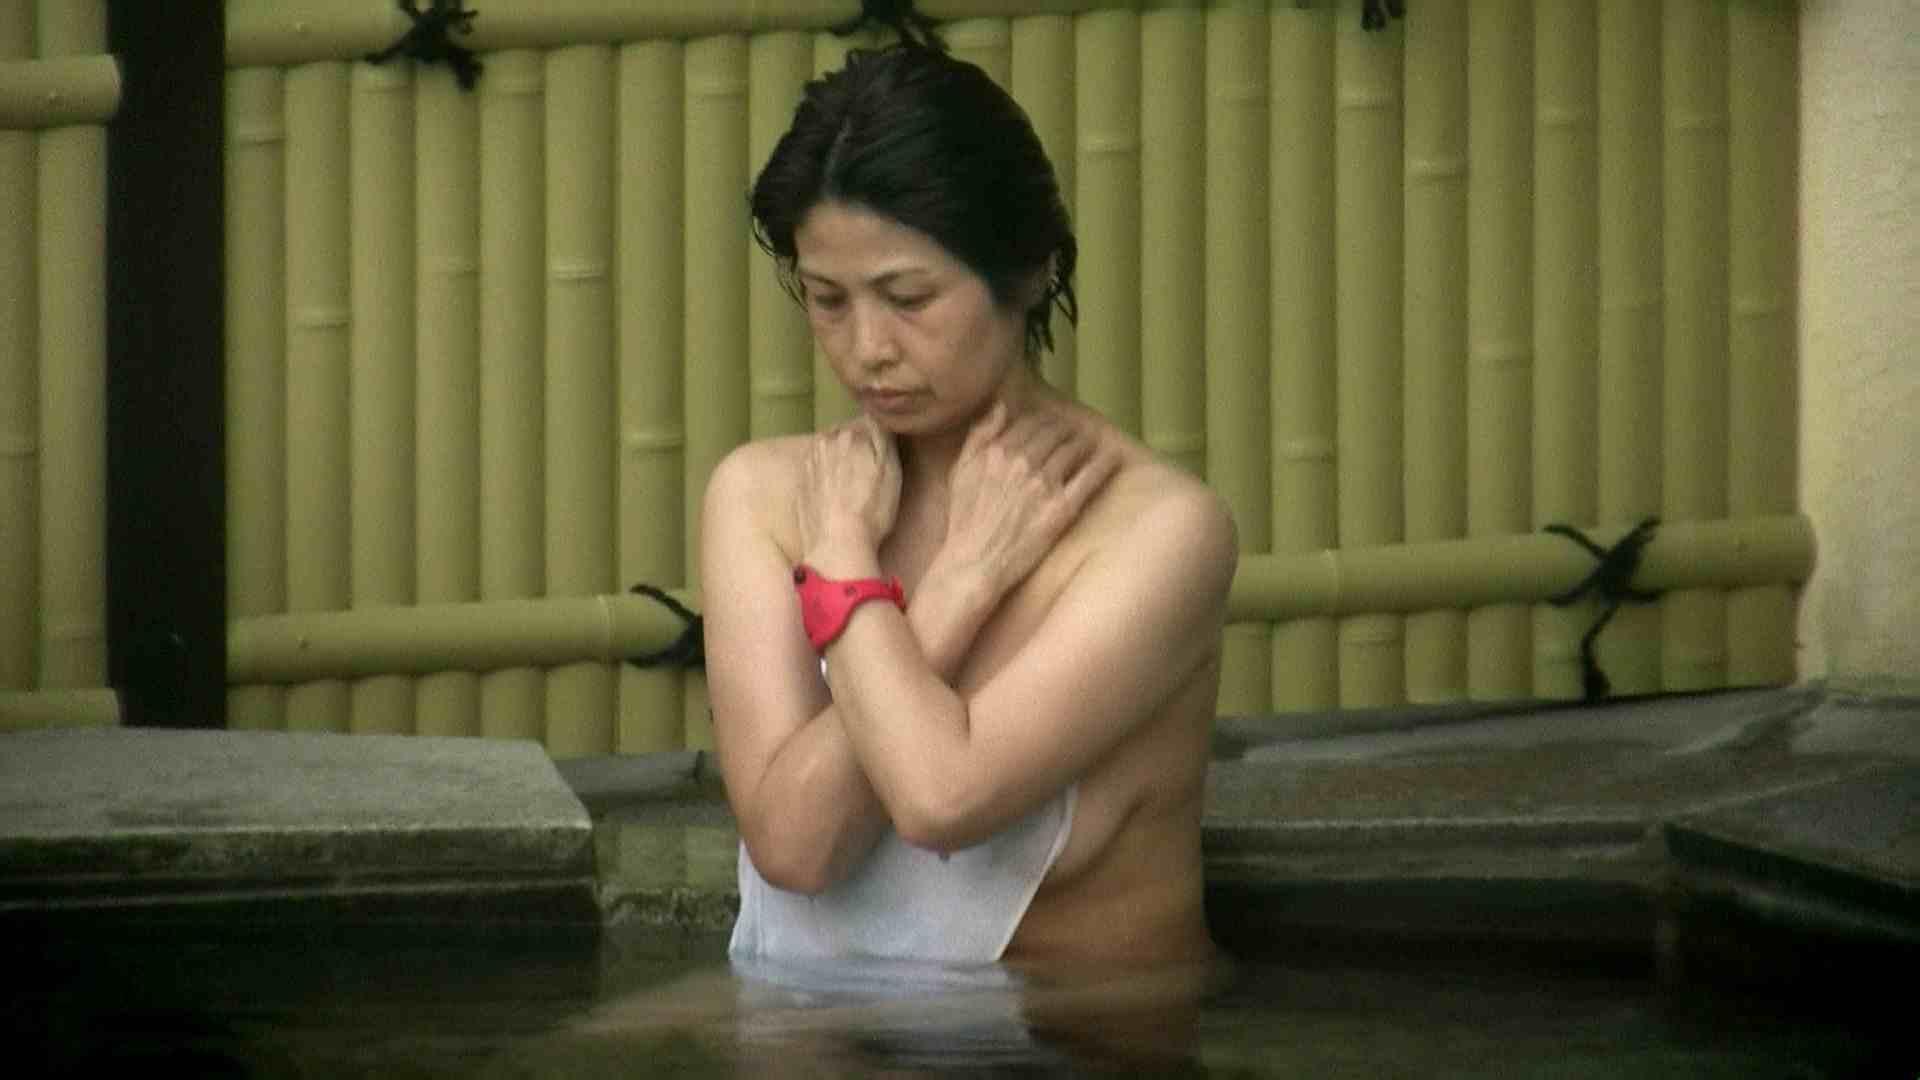 Aquaな露天風呂Vol.636 HなOL | 盗撮  82pic 34